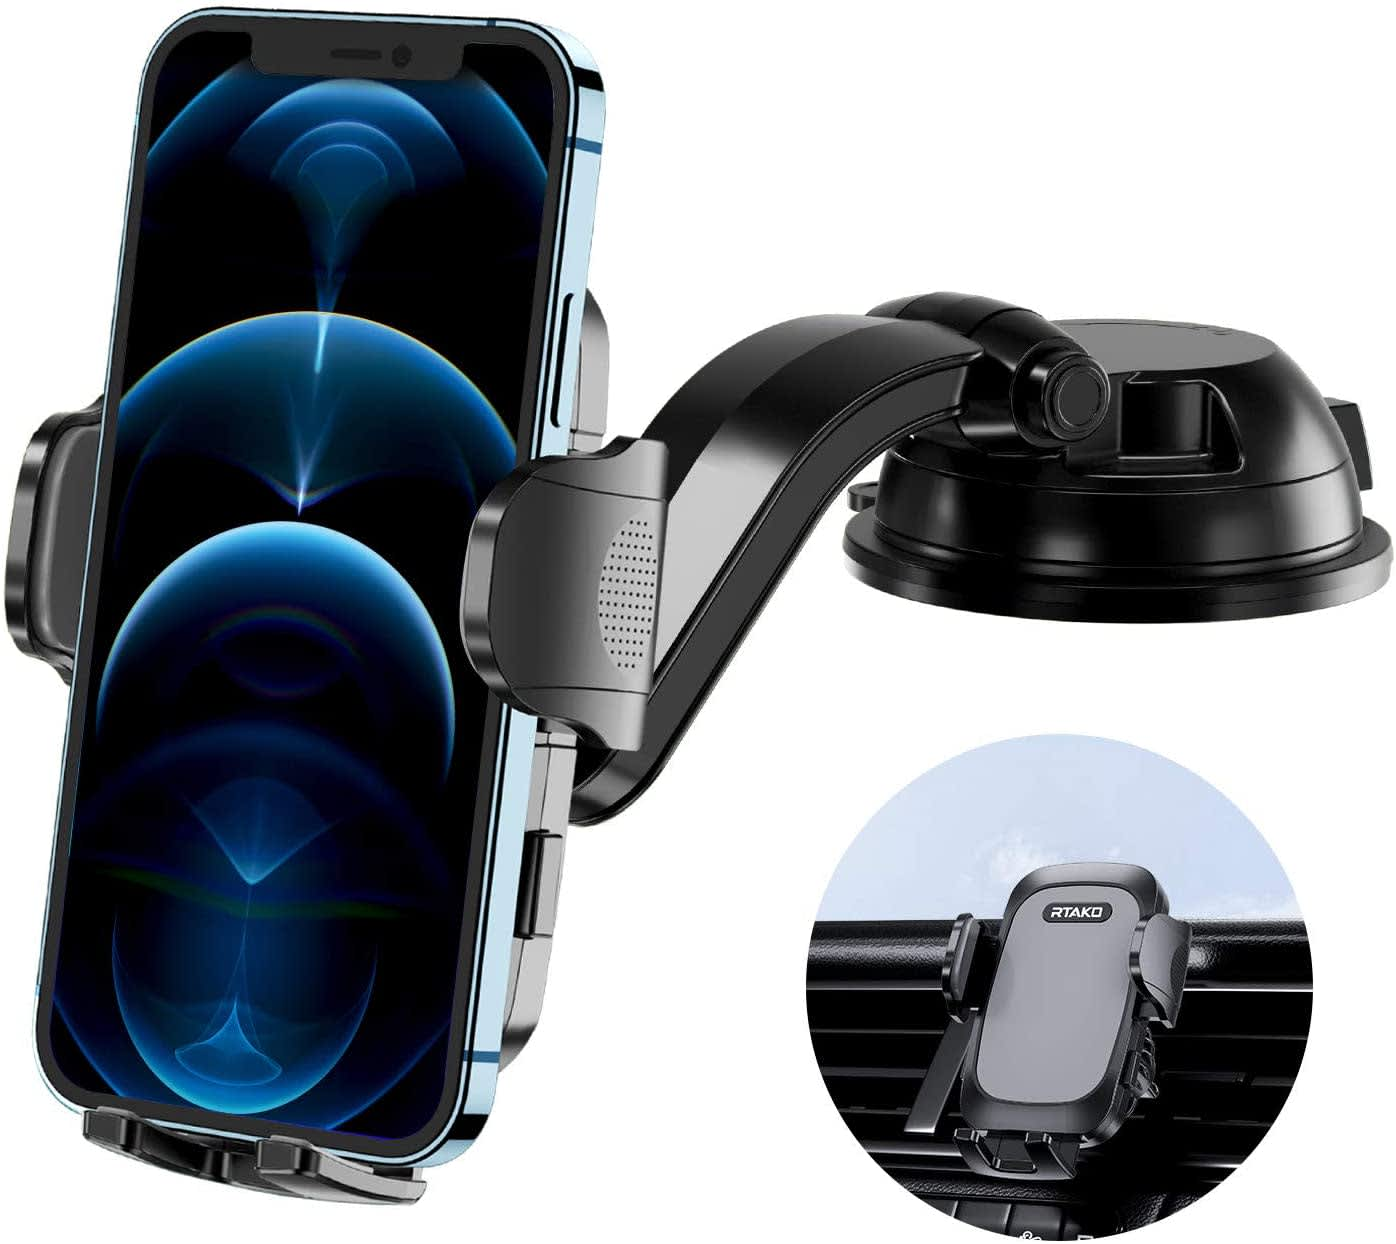 Rtako Universal Car Phone Mount